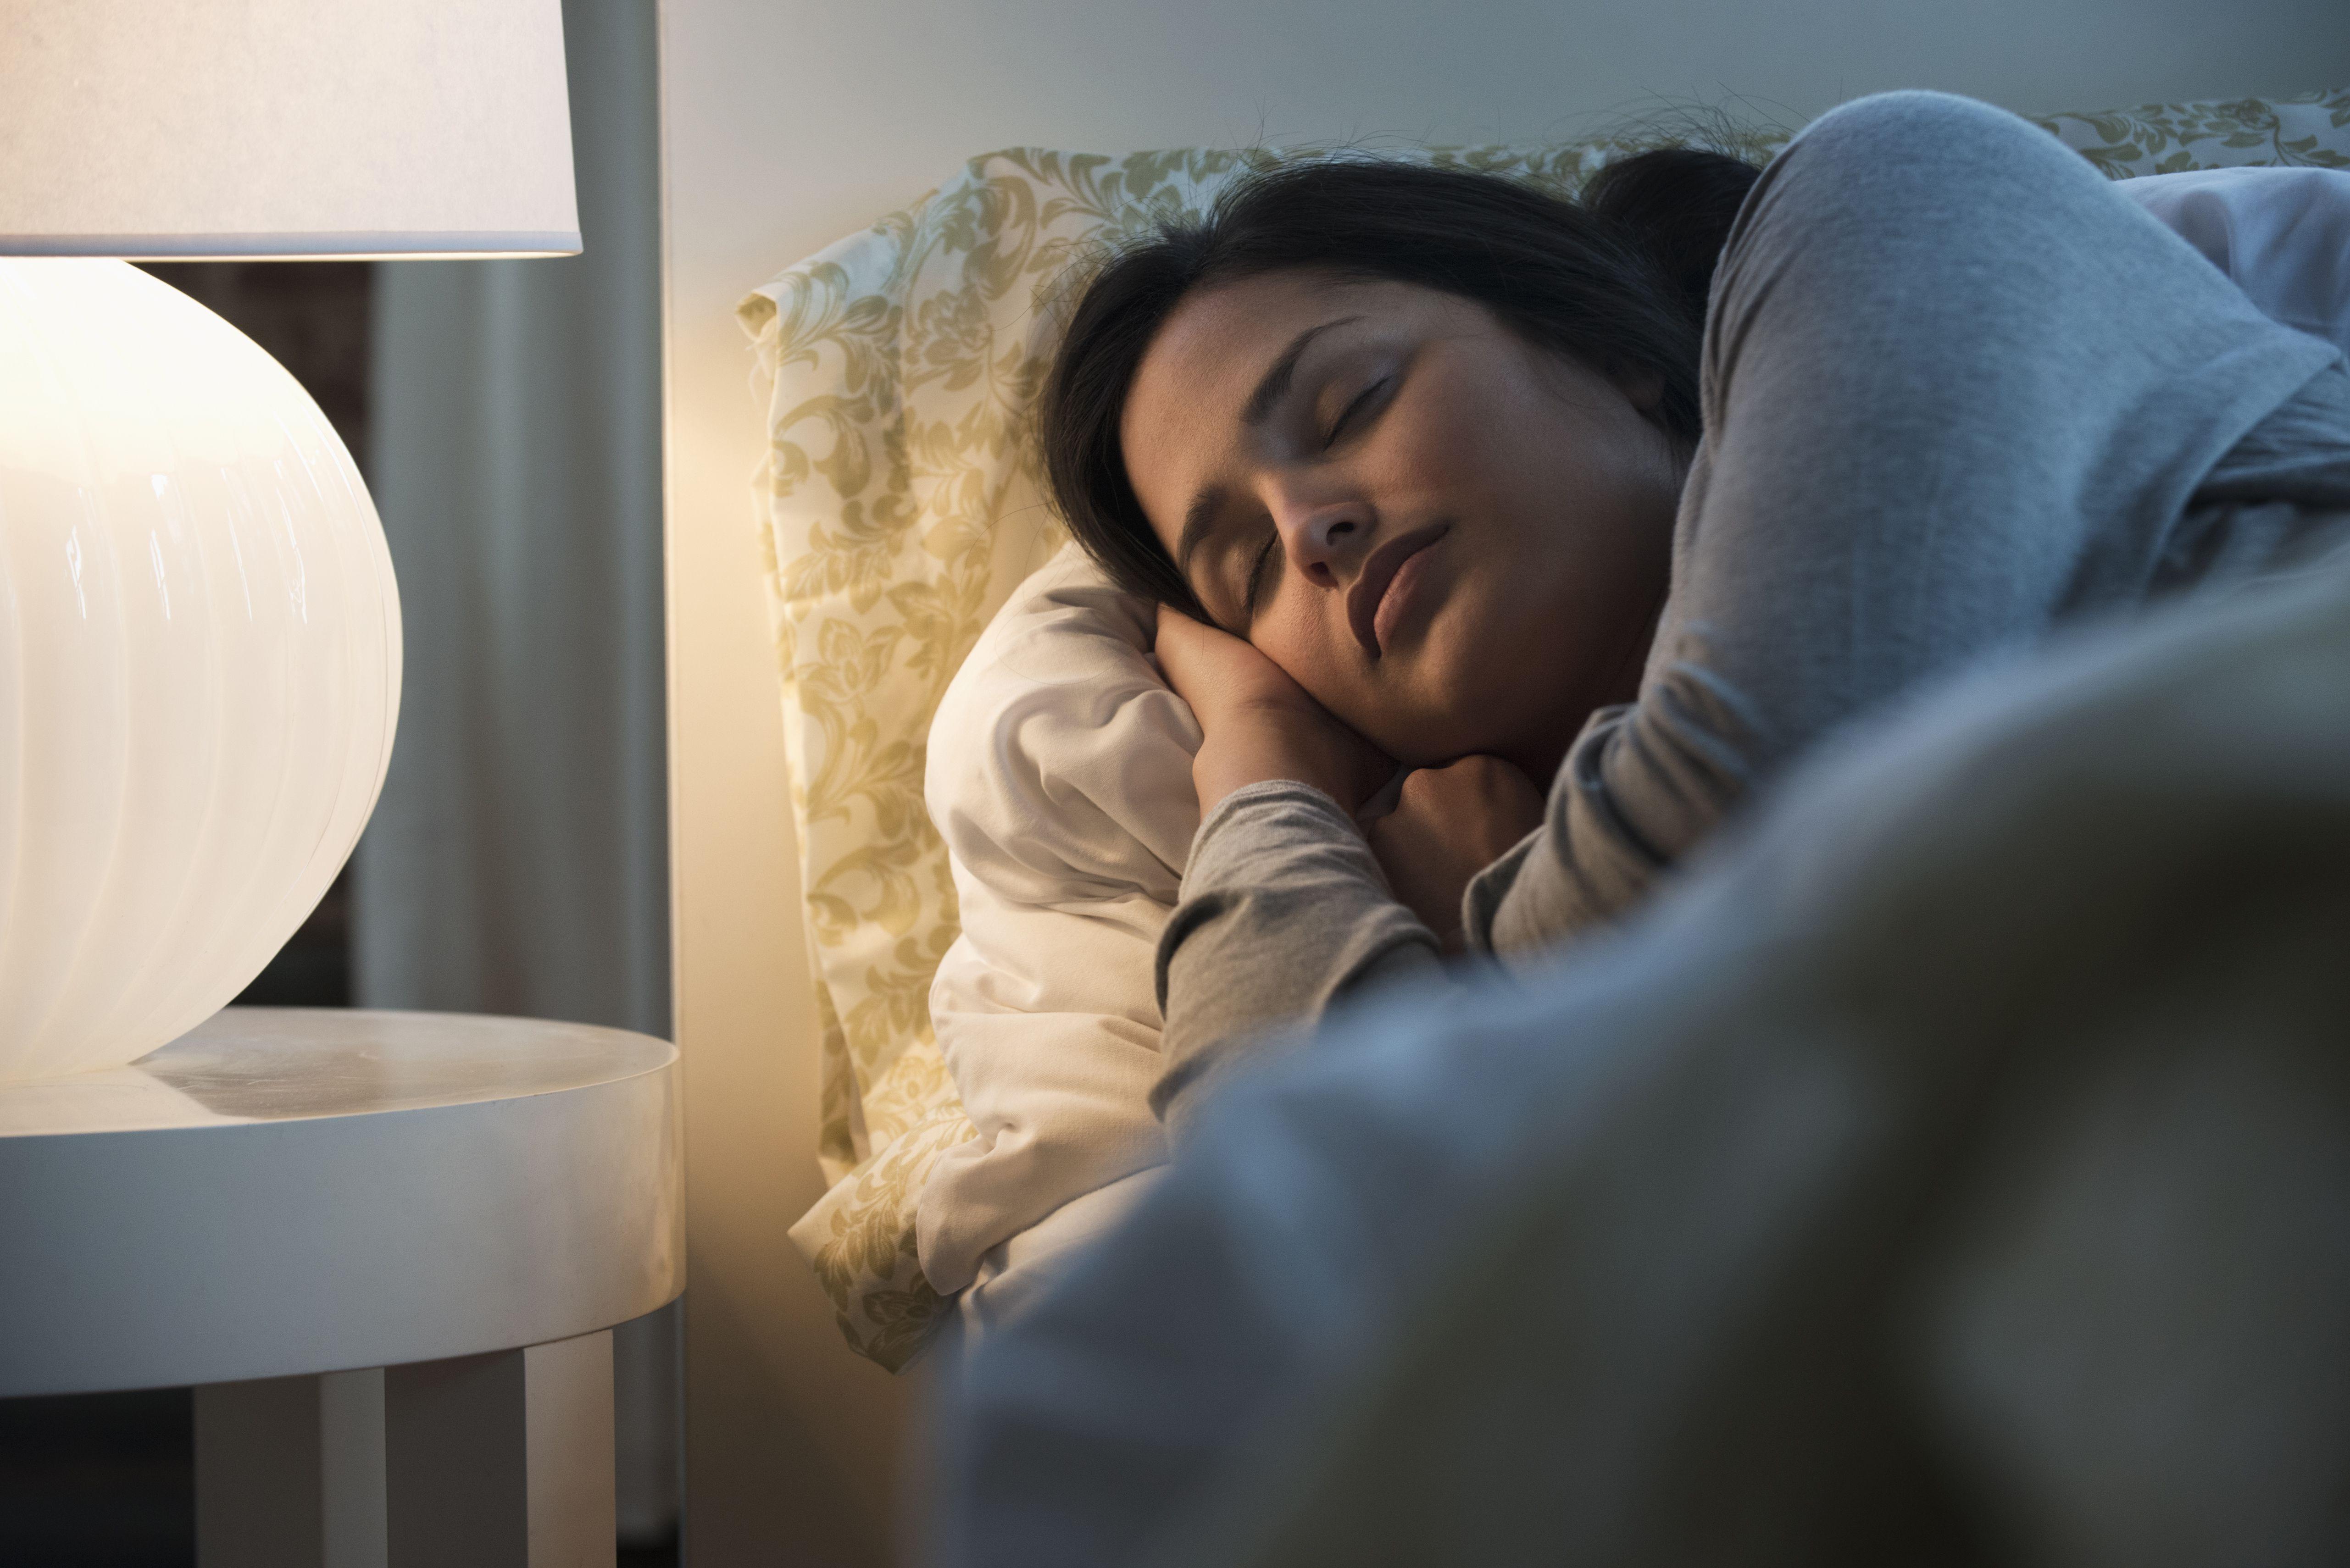 Lamp illuminating a sleeping woman with cozy, dreamy light